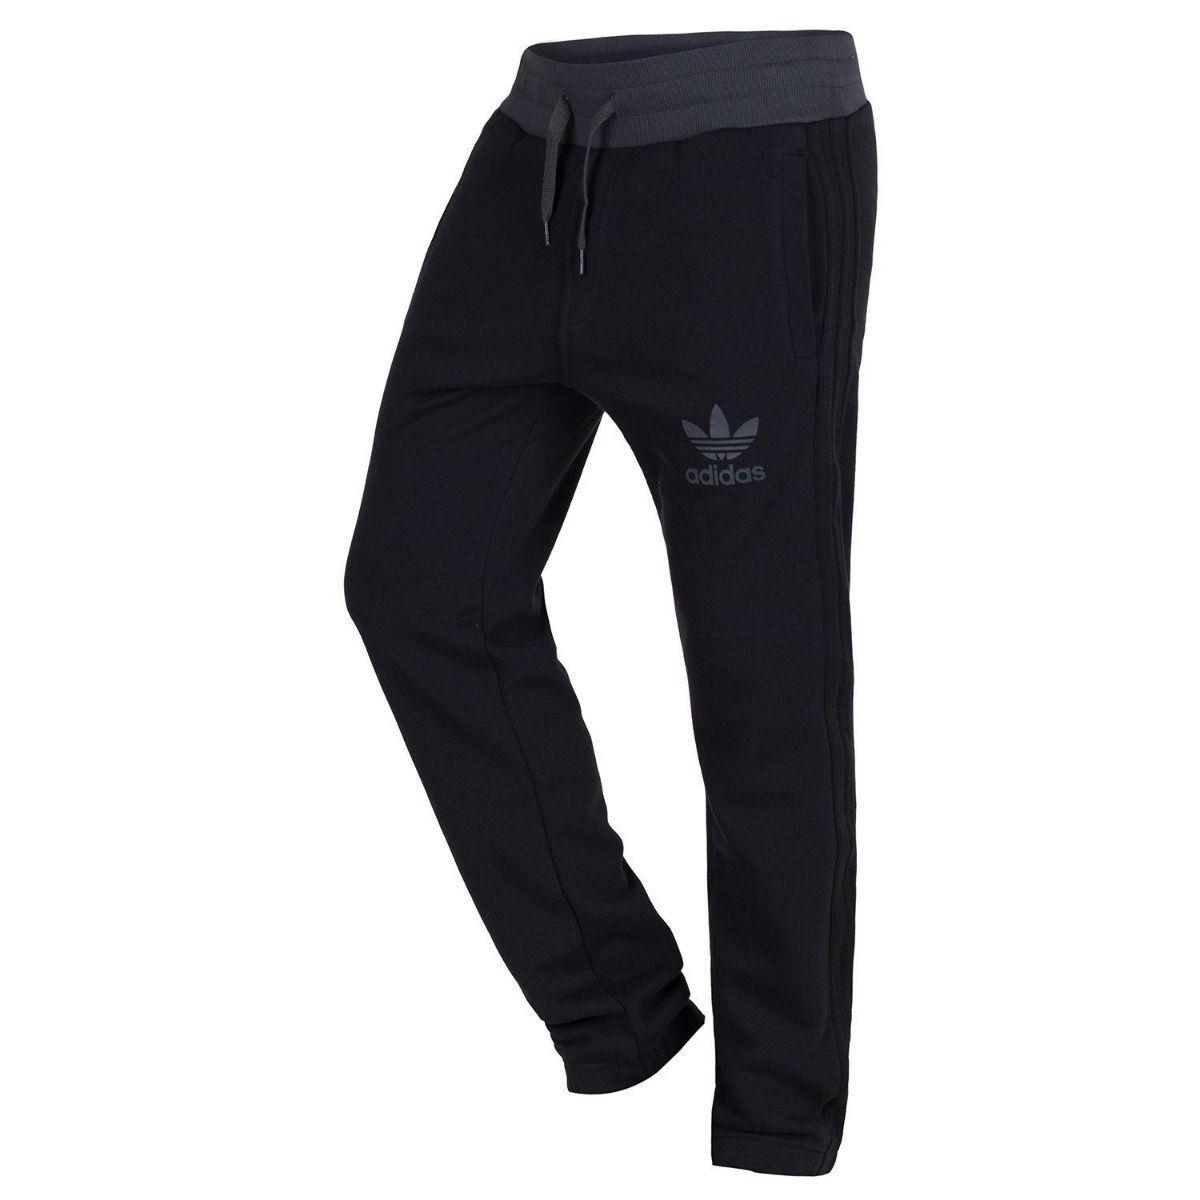 adidas uomo tuta pantaloni